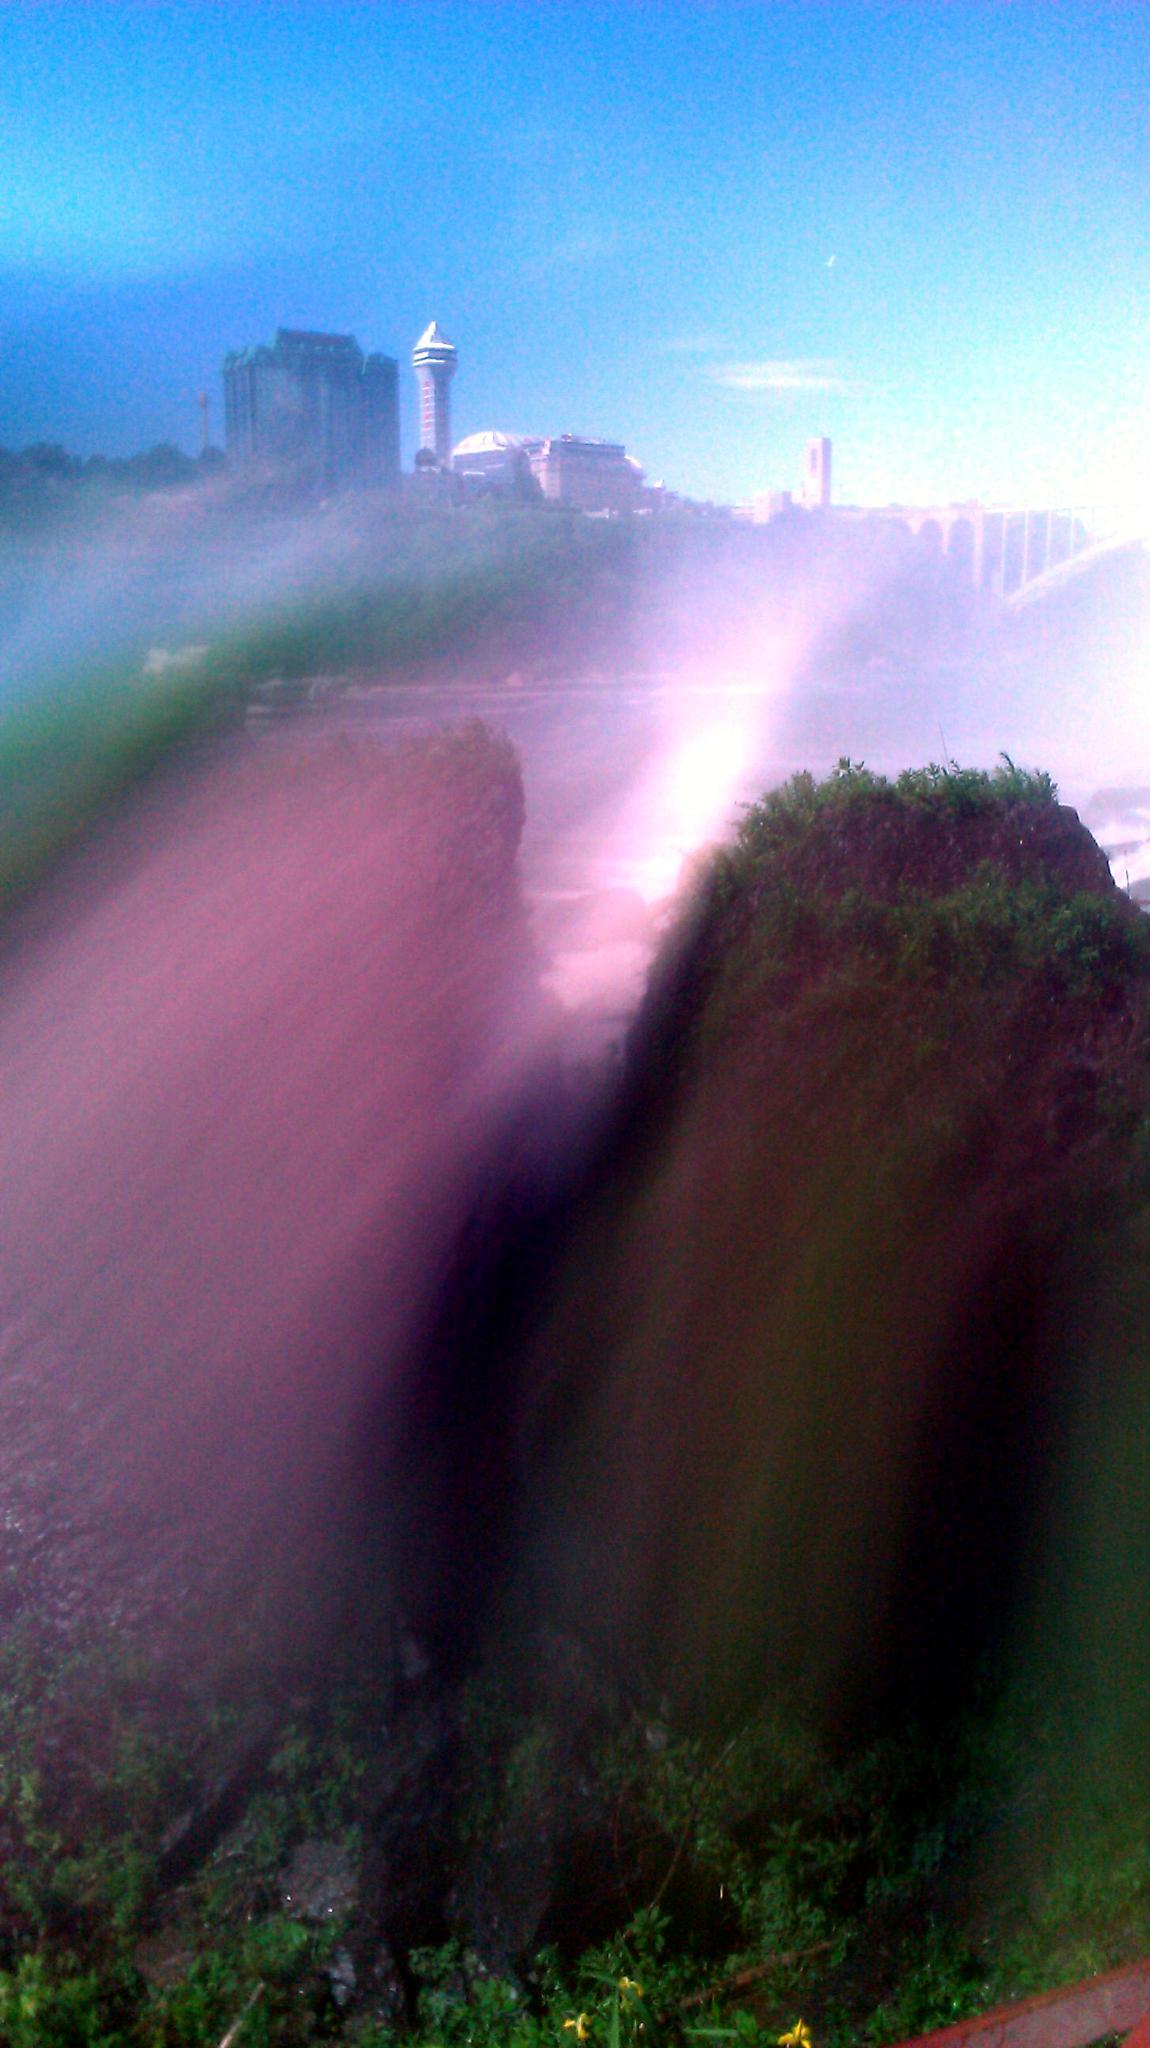 Through The Mist by rhonda.j.lewis